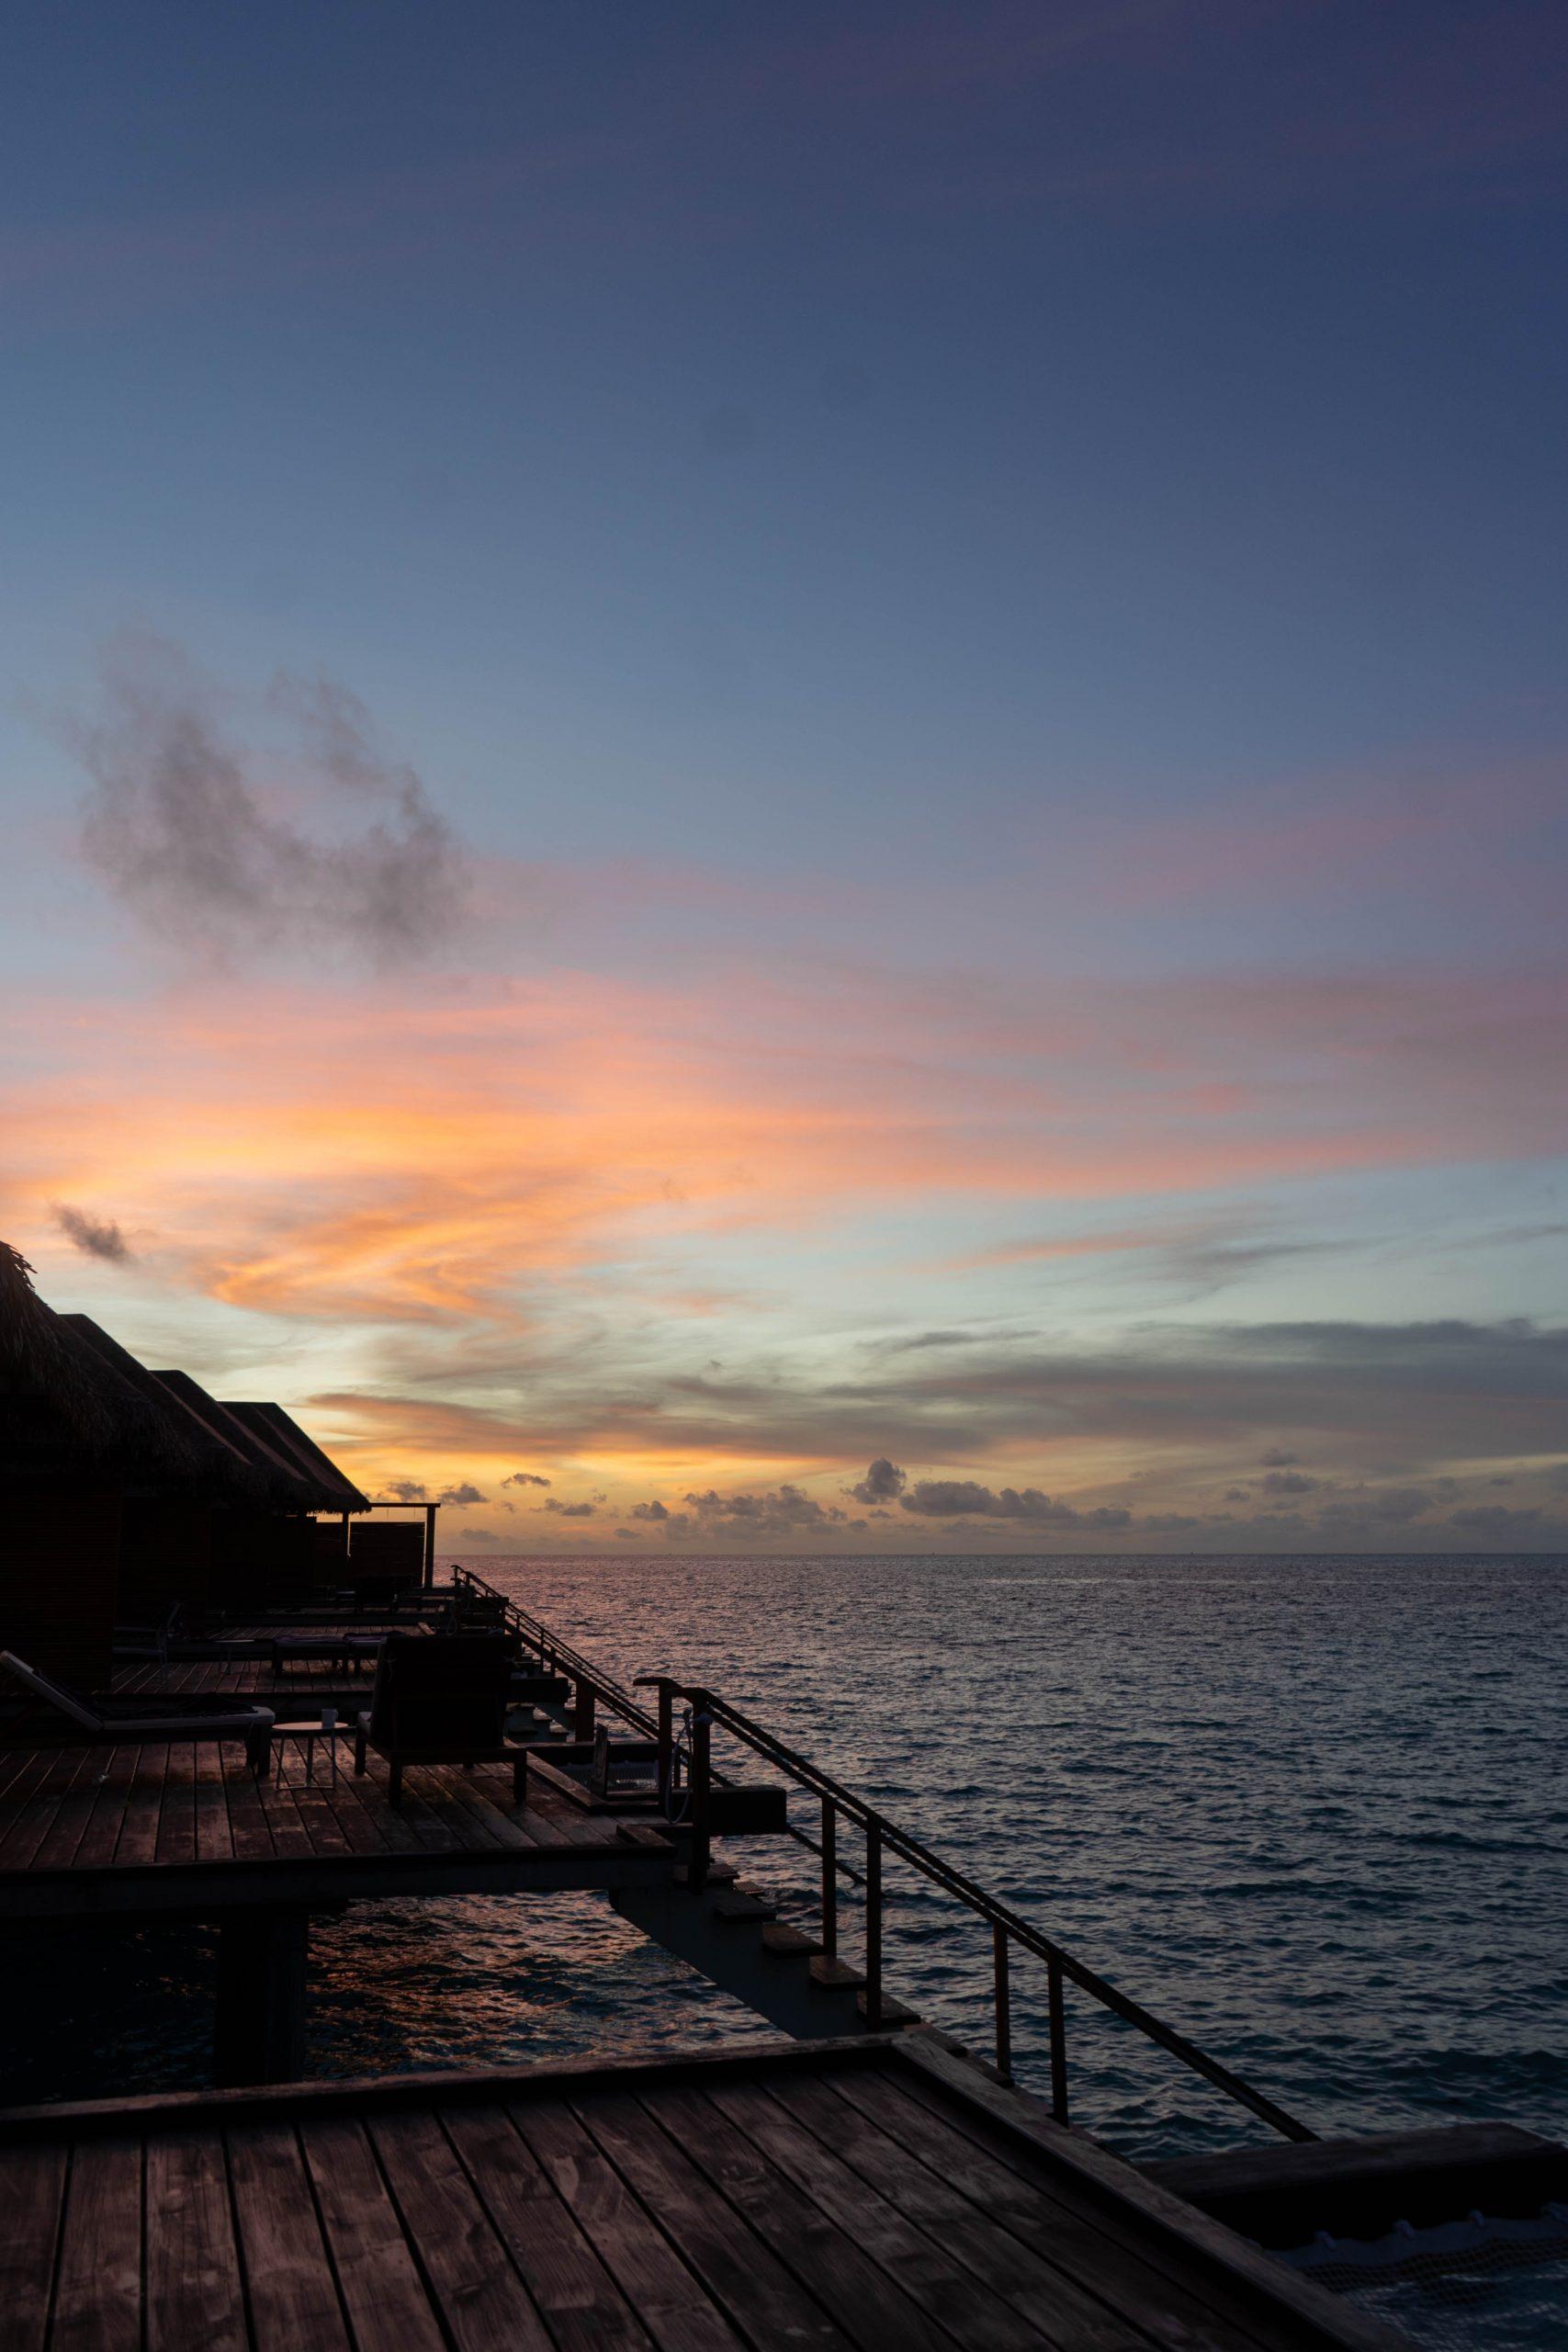 sunset overwater villa cinnamon velifushi maldives south asia indian ocean